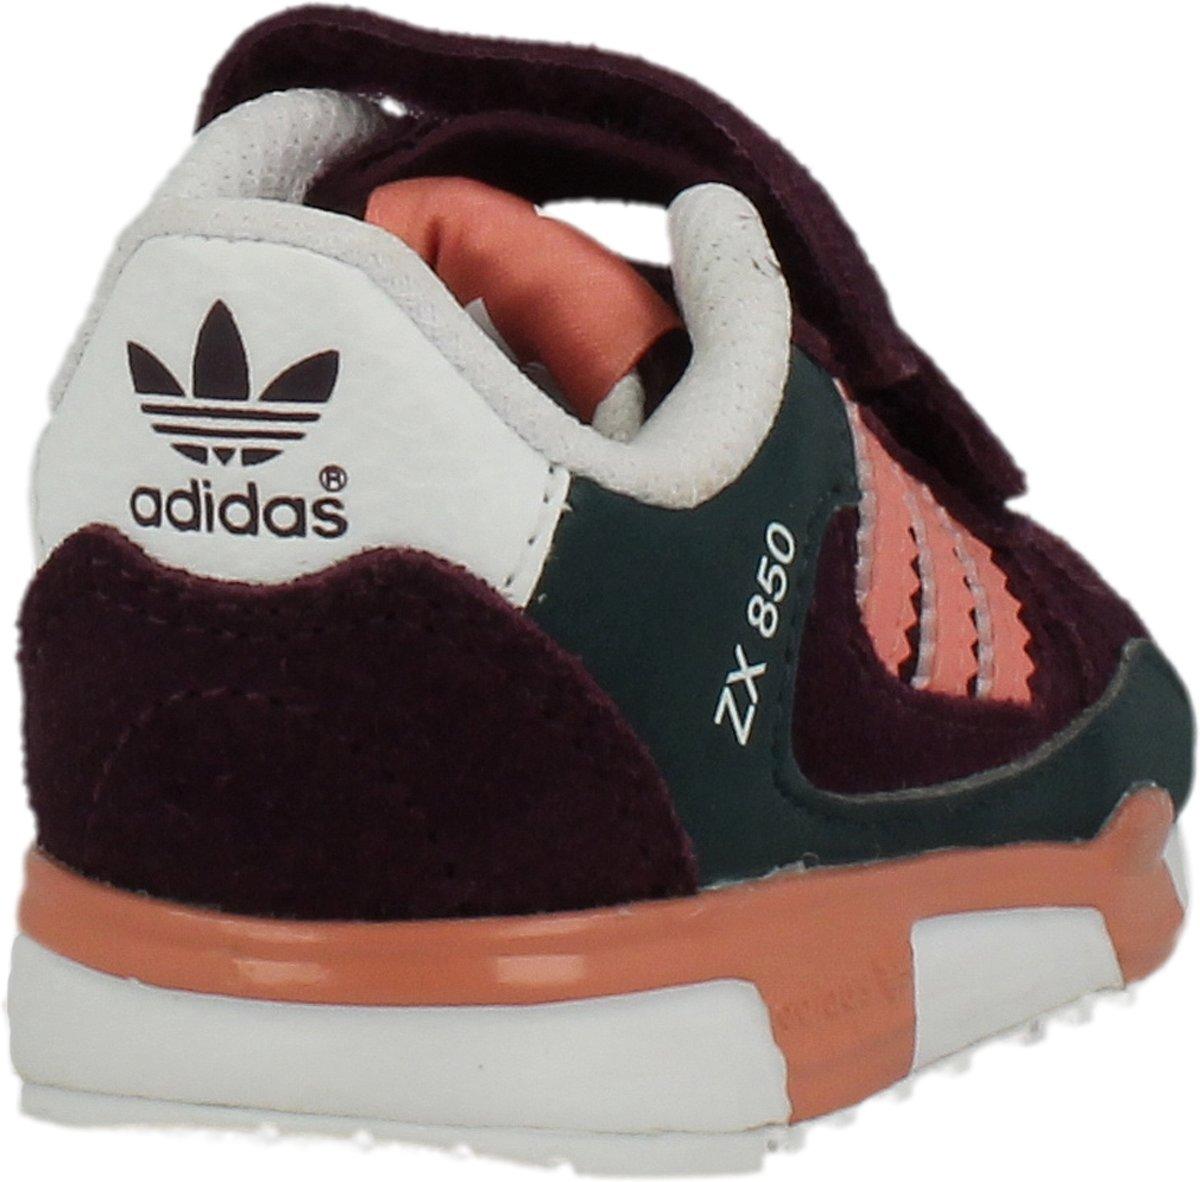 competitive price b83eb d7f24 ... new zealand bol adidas zx 850 cf i b25612 paarsroze maat 23 142fb 8b3ef